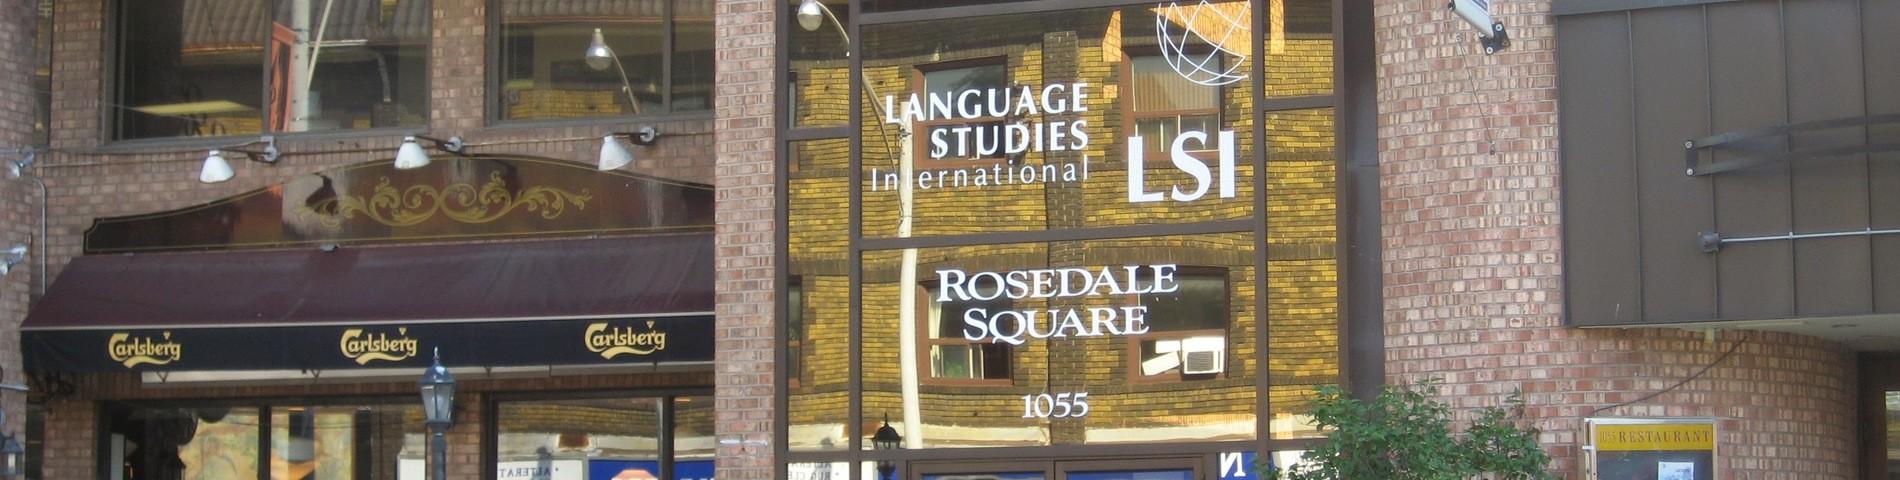 LSI - Language Studies International photo 1